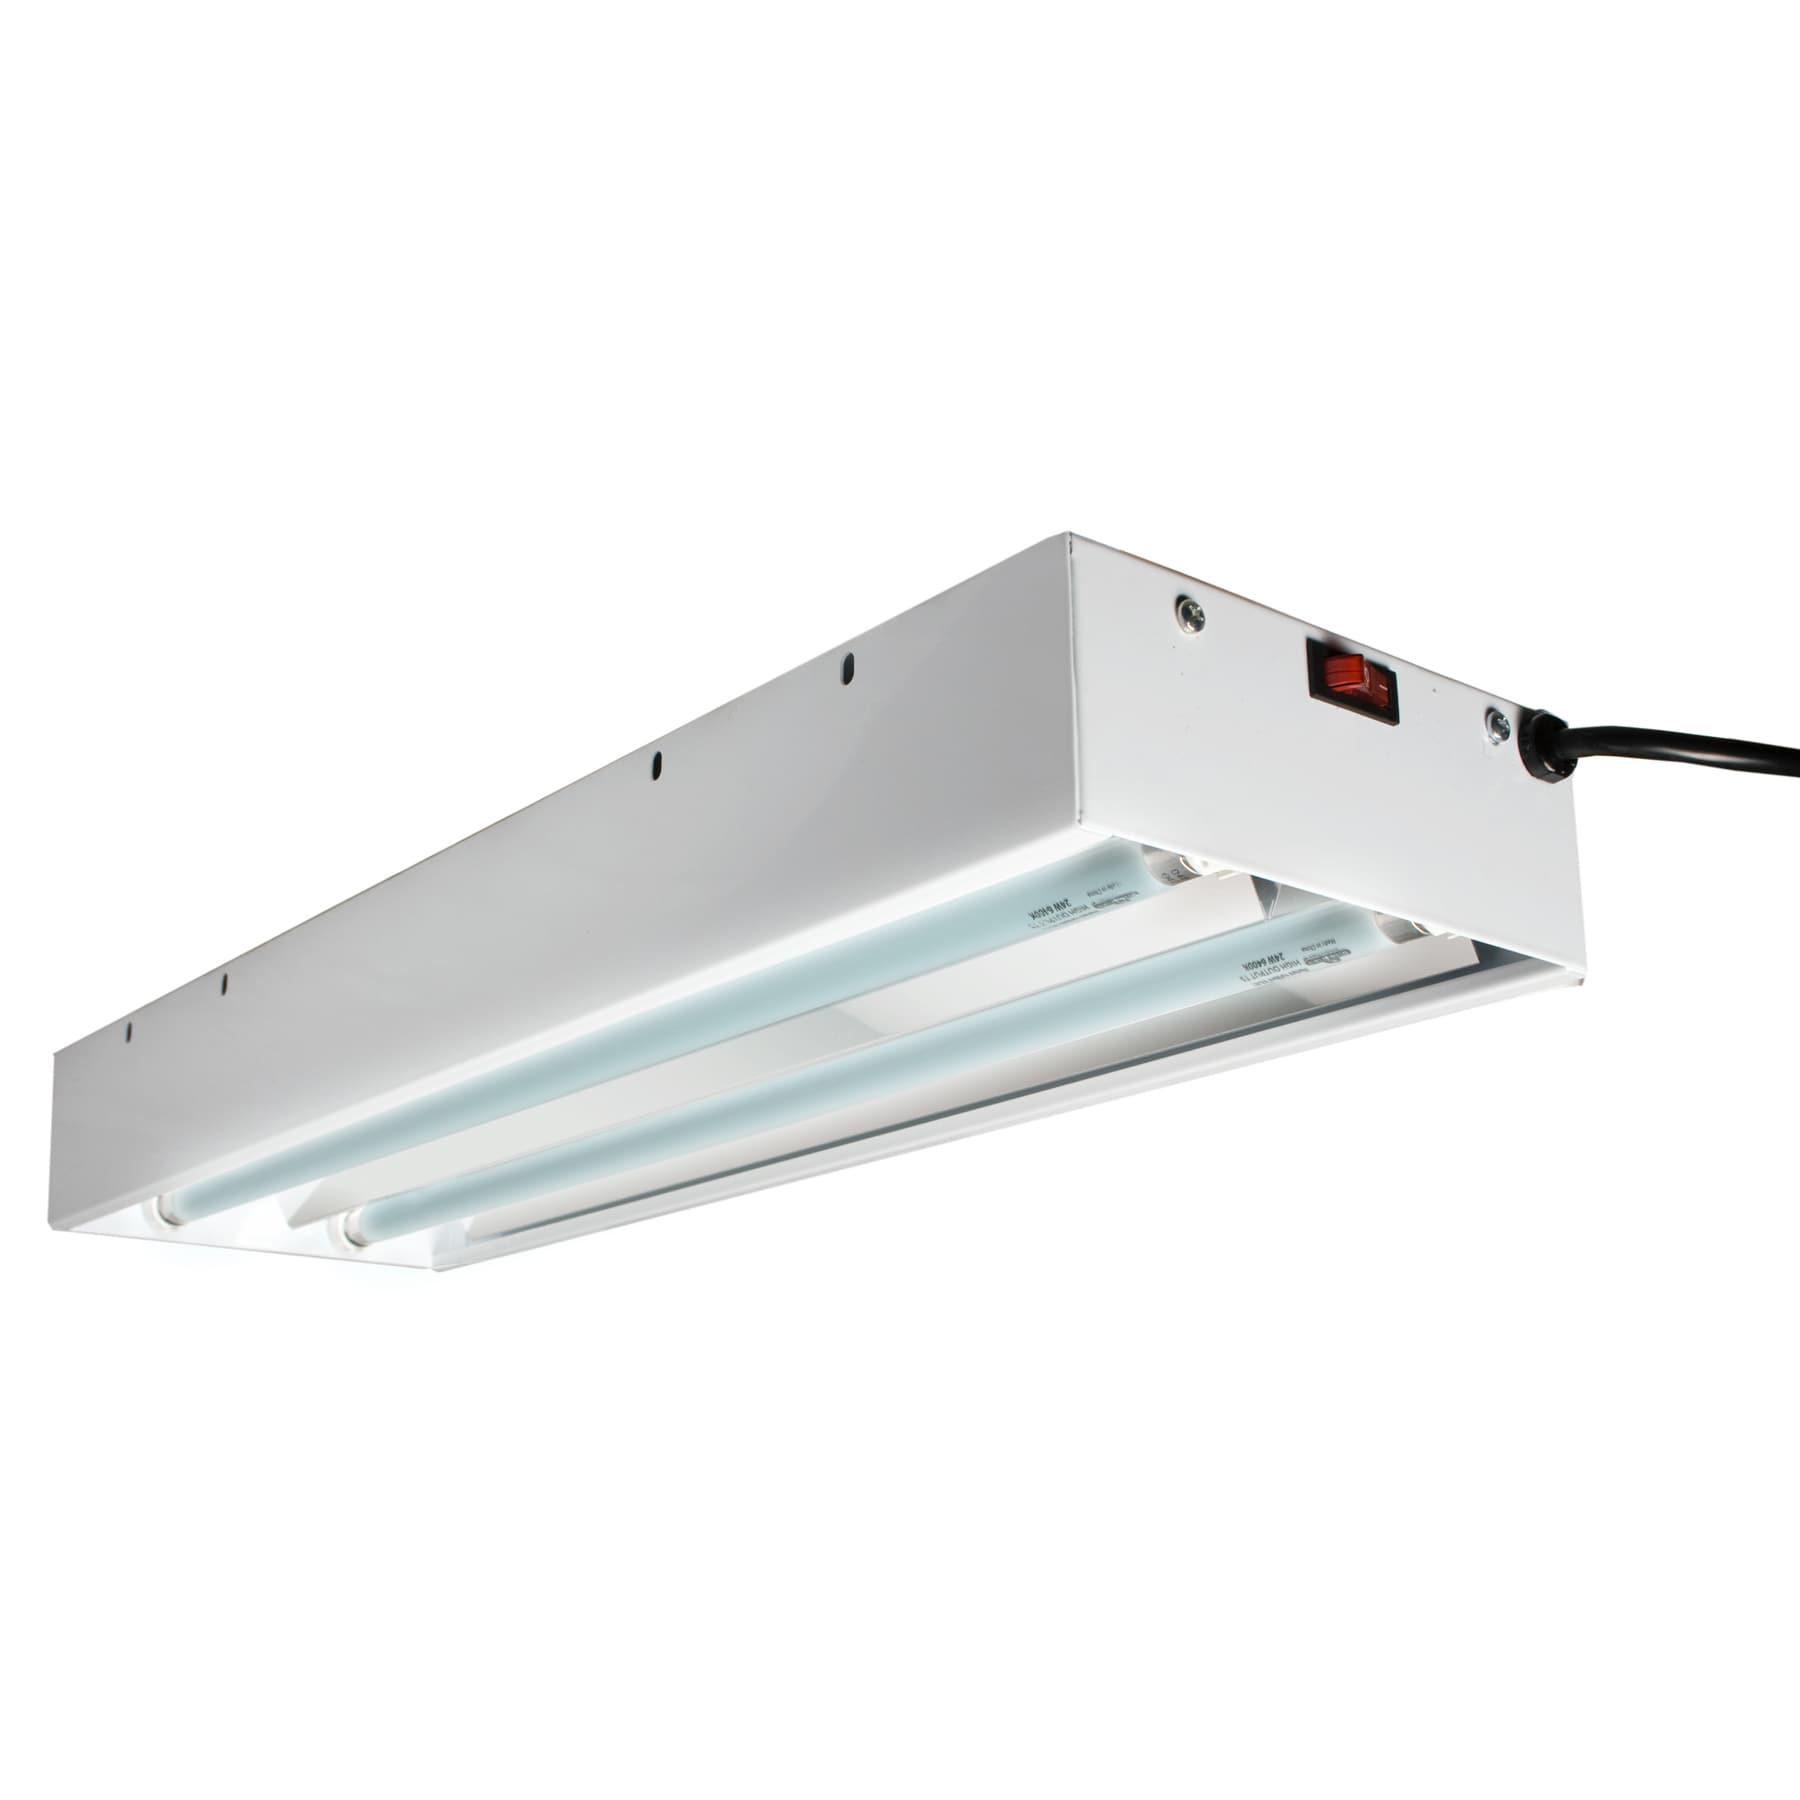 Hydrofarm flt22 two tube t5 fluorescent light system